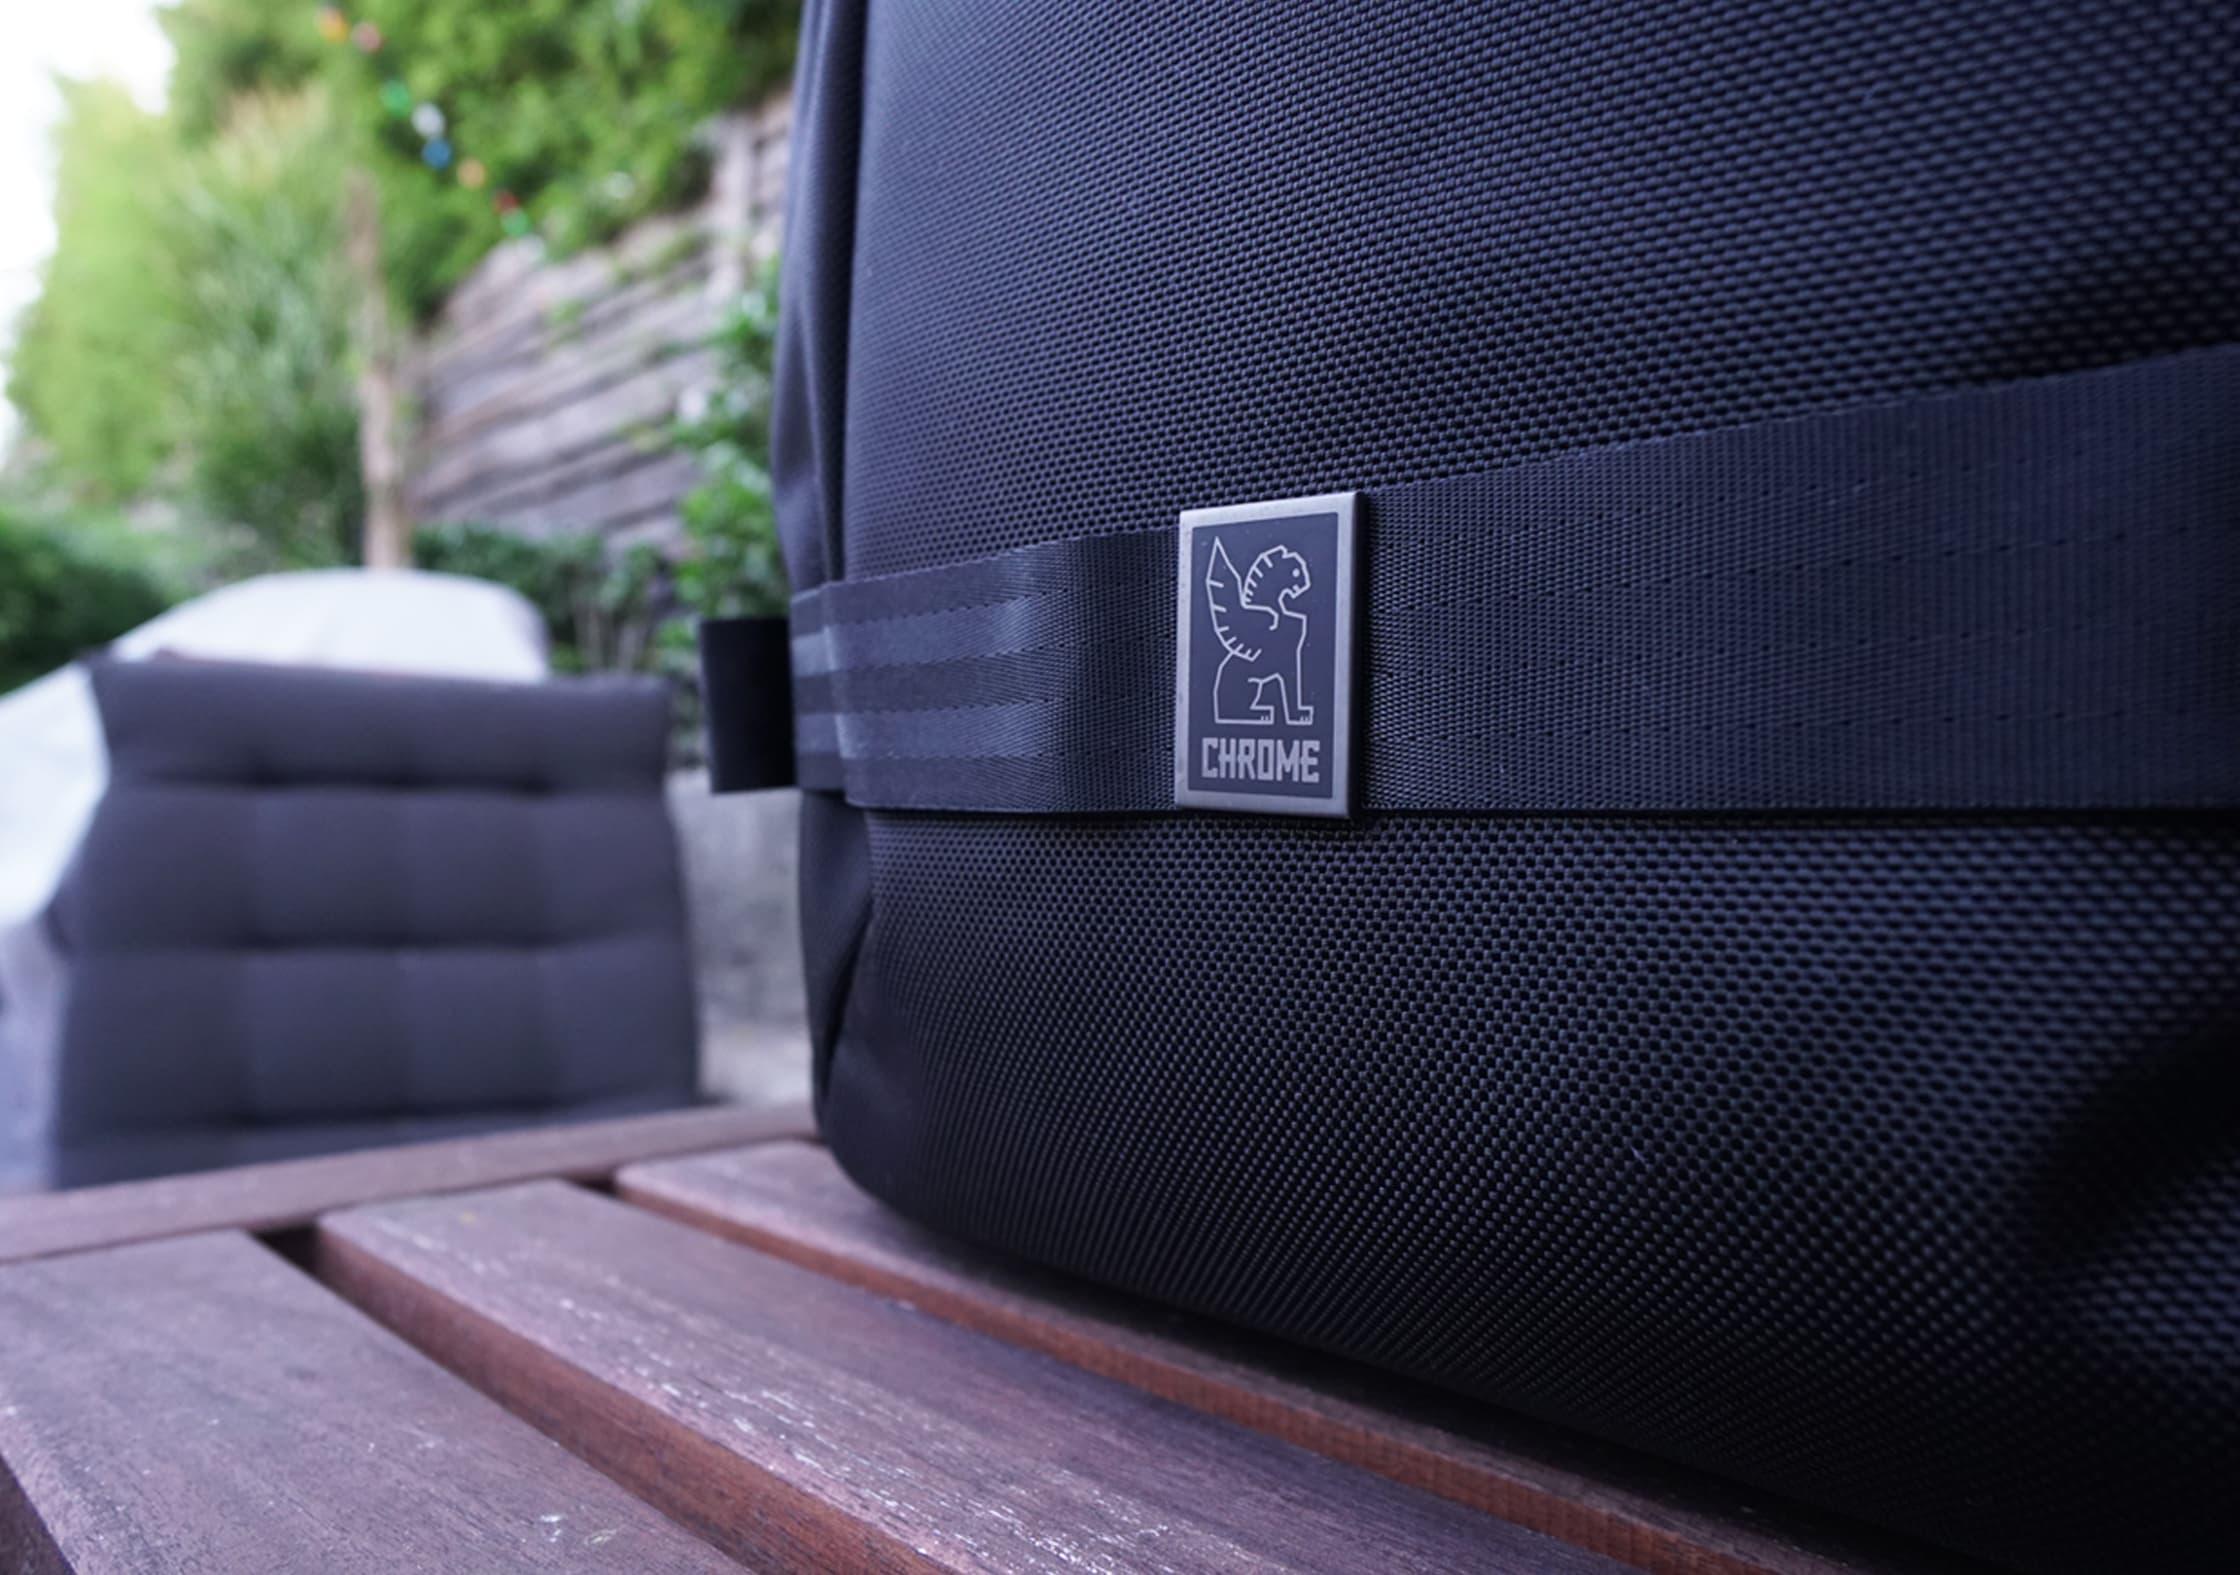 Chrome Macheto Travel Backpack Logo